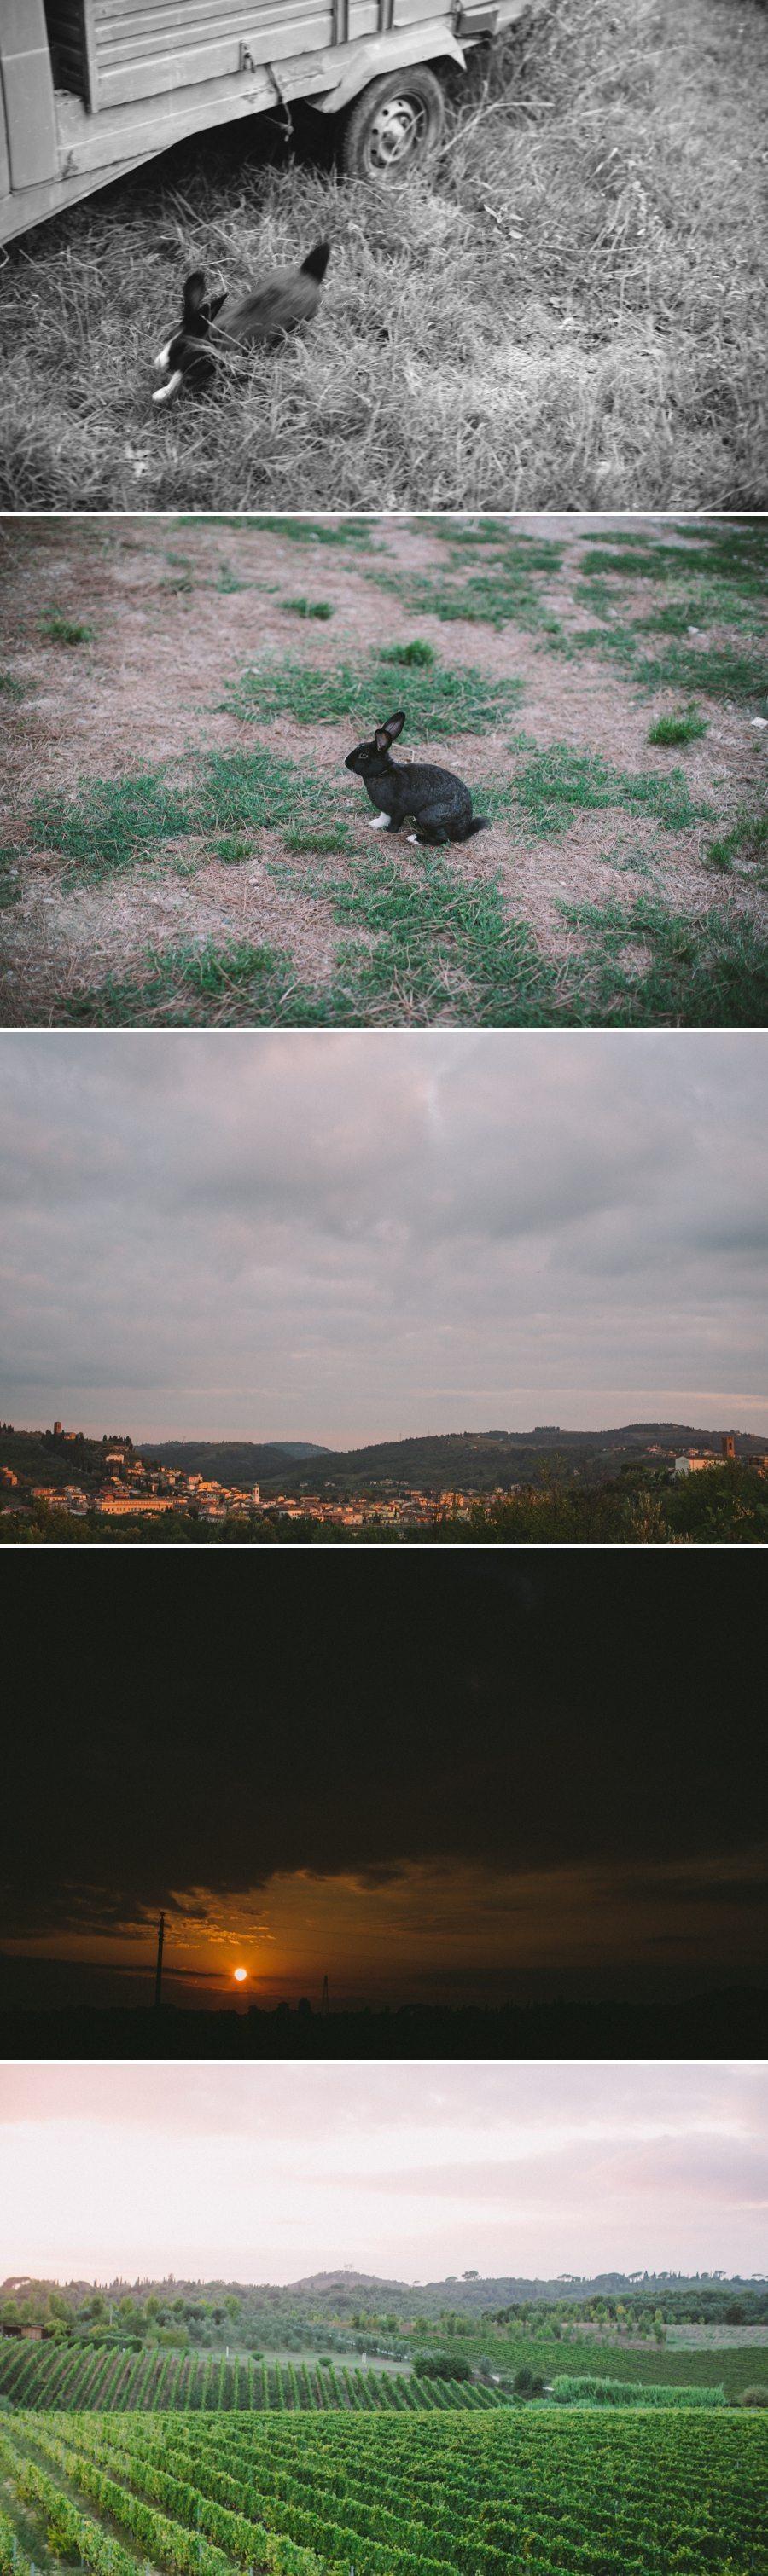 2013-11-11_0070